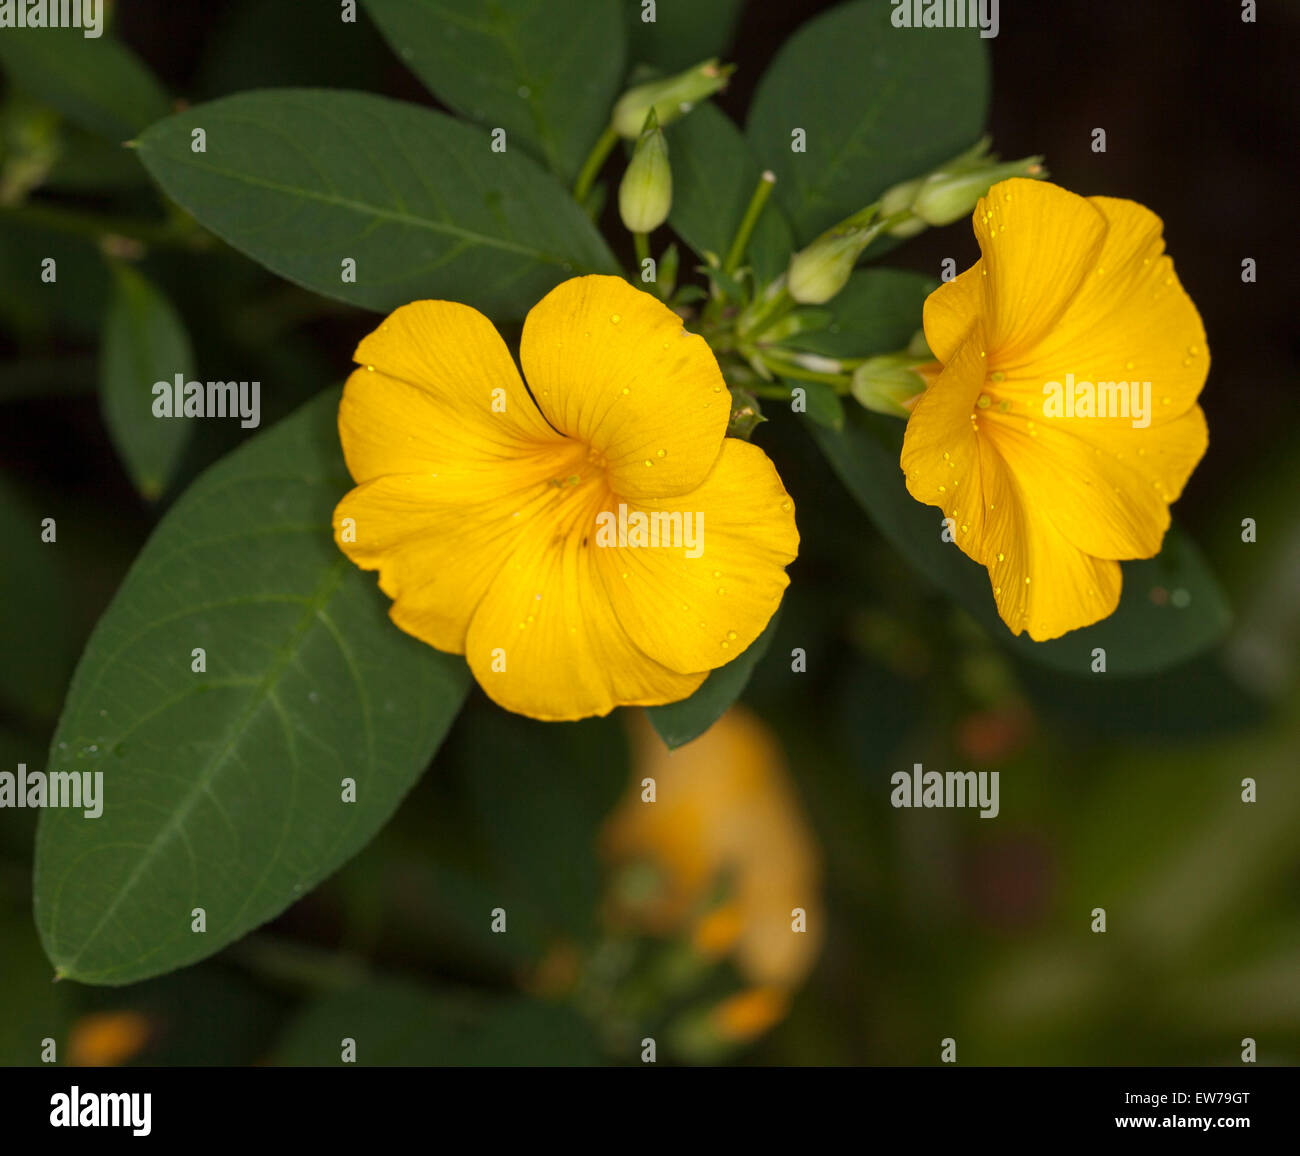 Vivid deep yellow flowers and dark green leaves of reinwardtia stock vivid deep yellow flowers and dark green leaves of reinwardtia indica golden dollar bush on dark background mightylinksfo